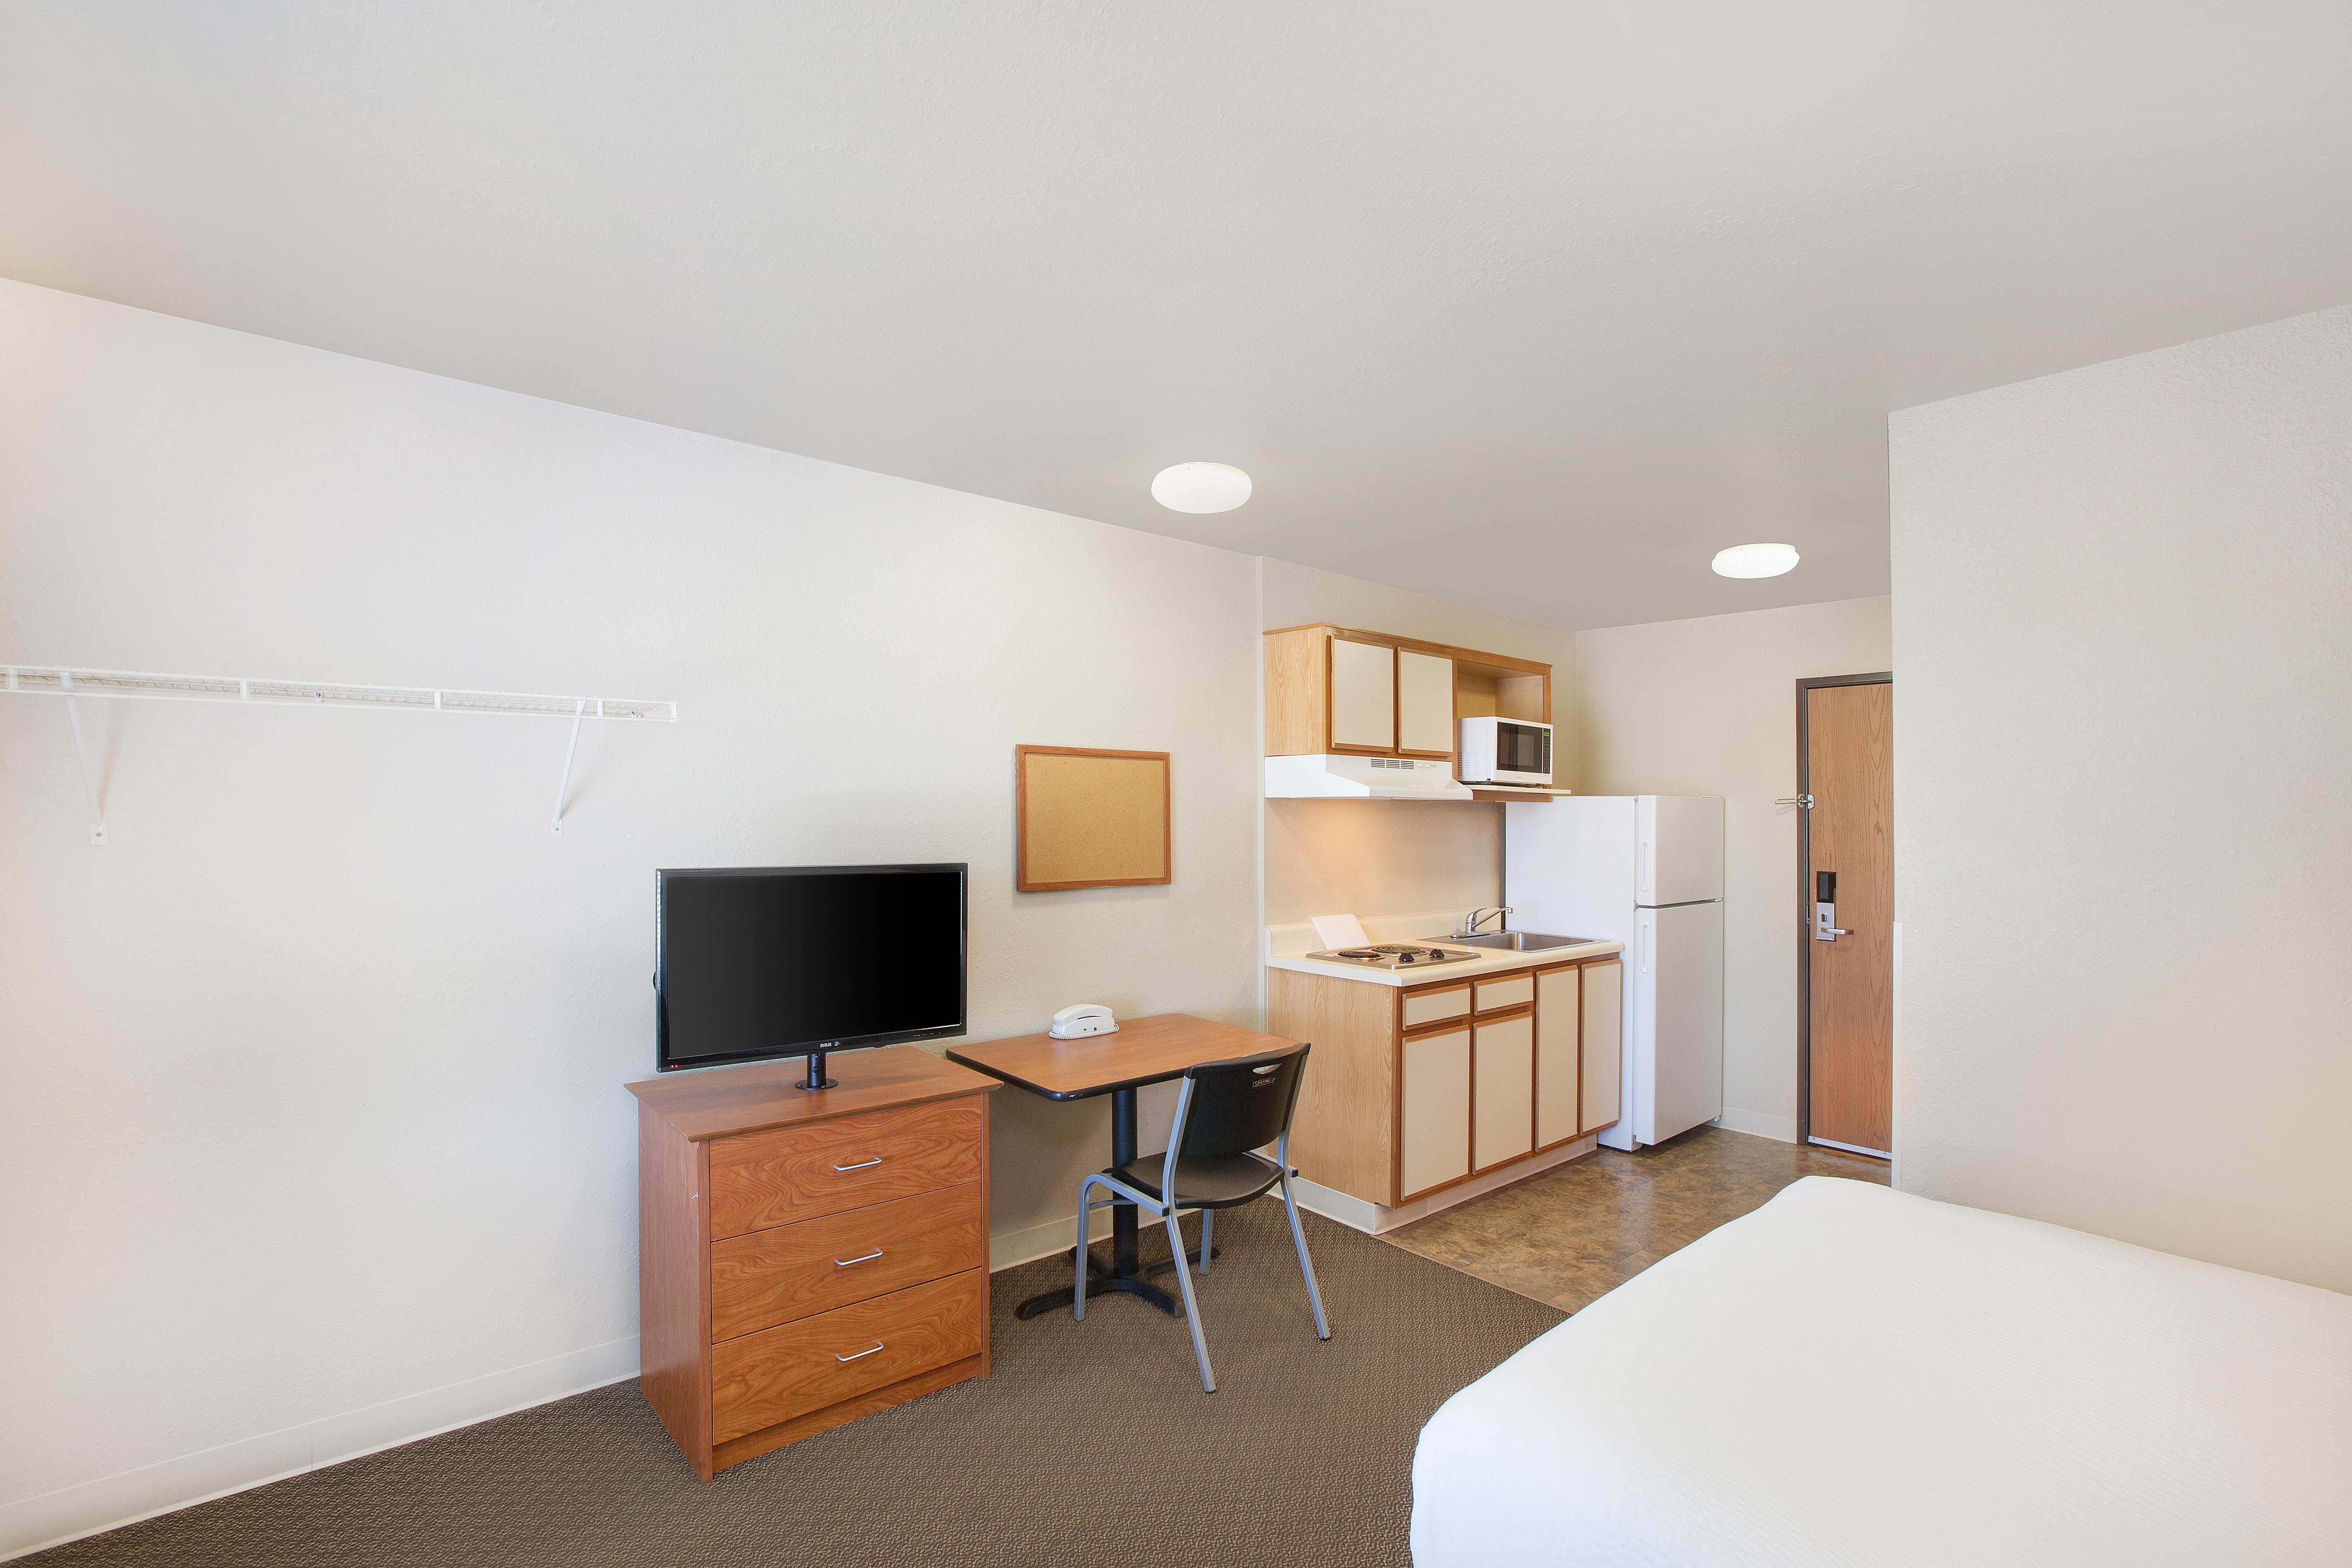 WoodSpring Suites Jacksonville Southeast image 6